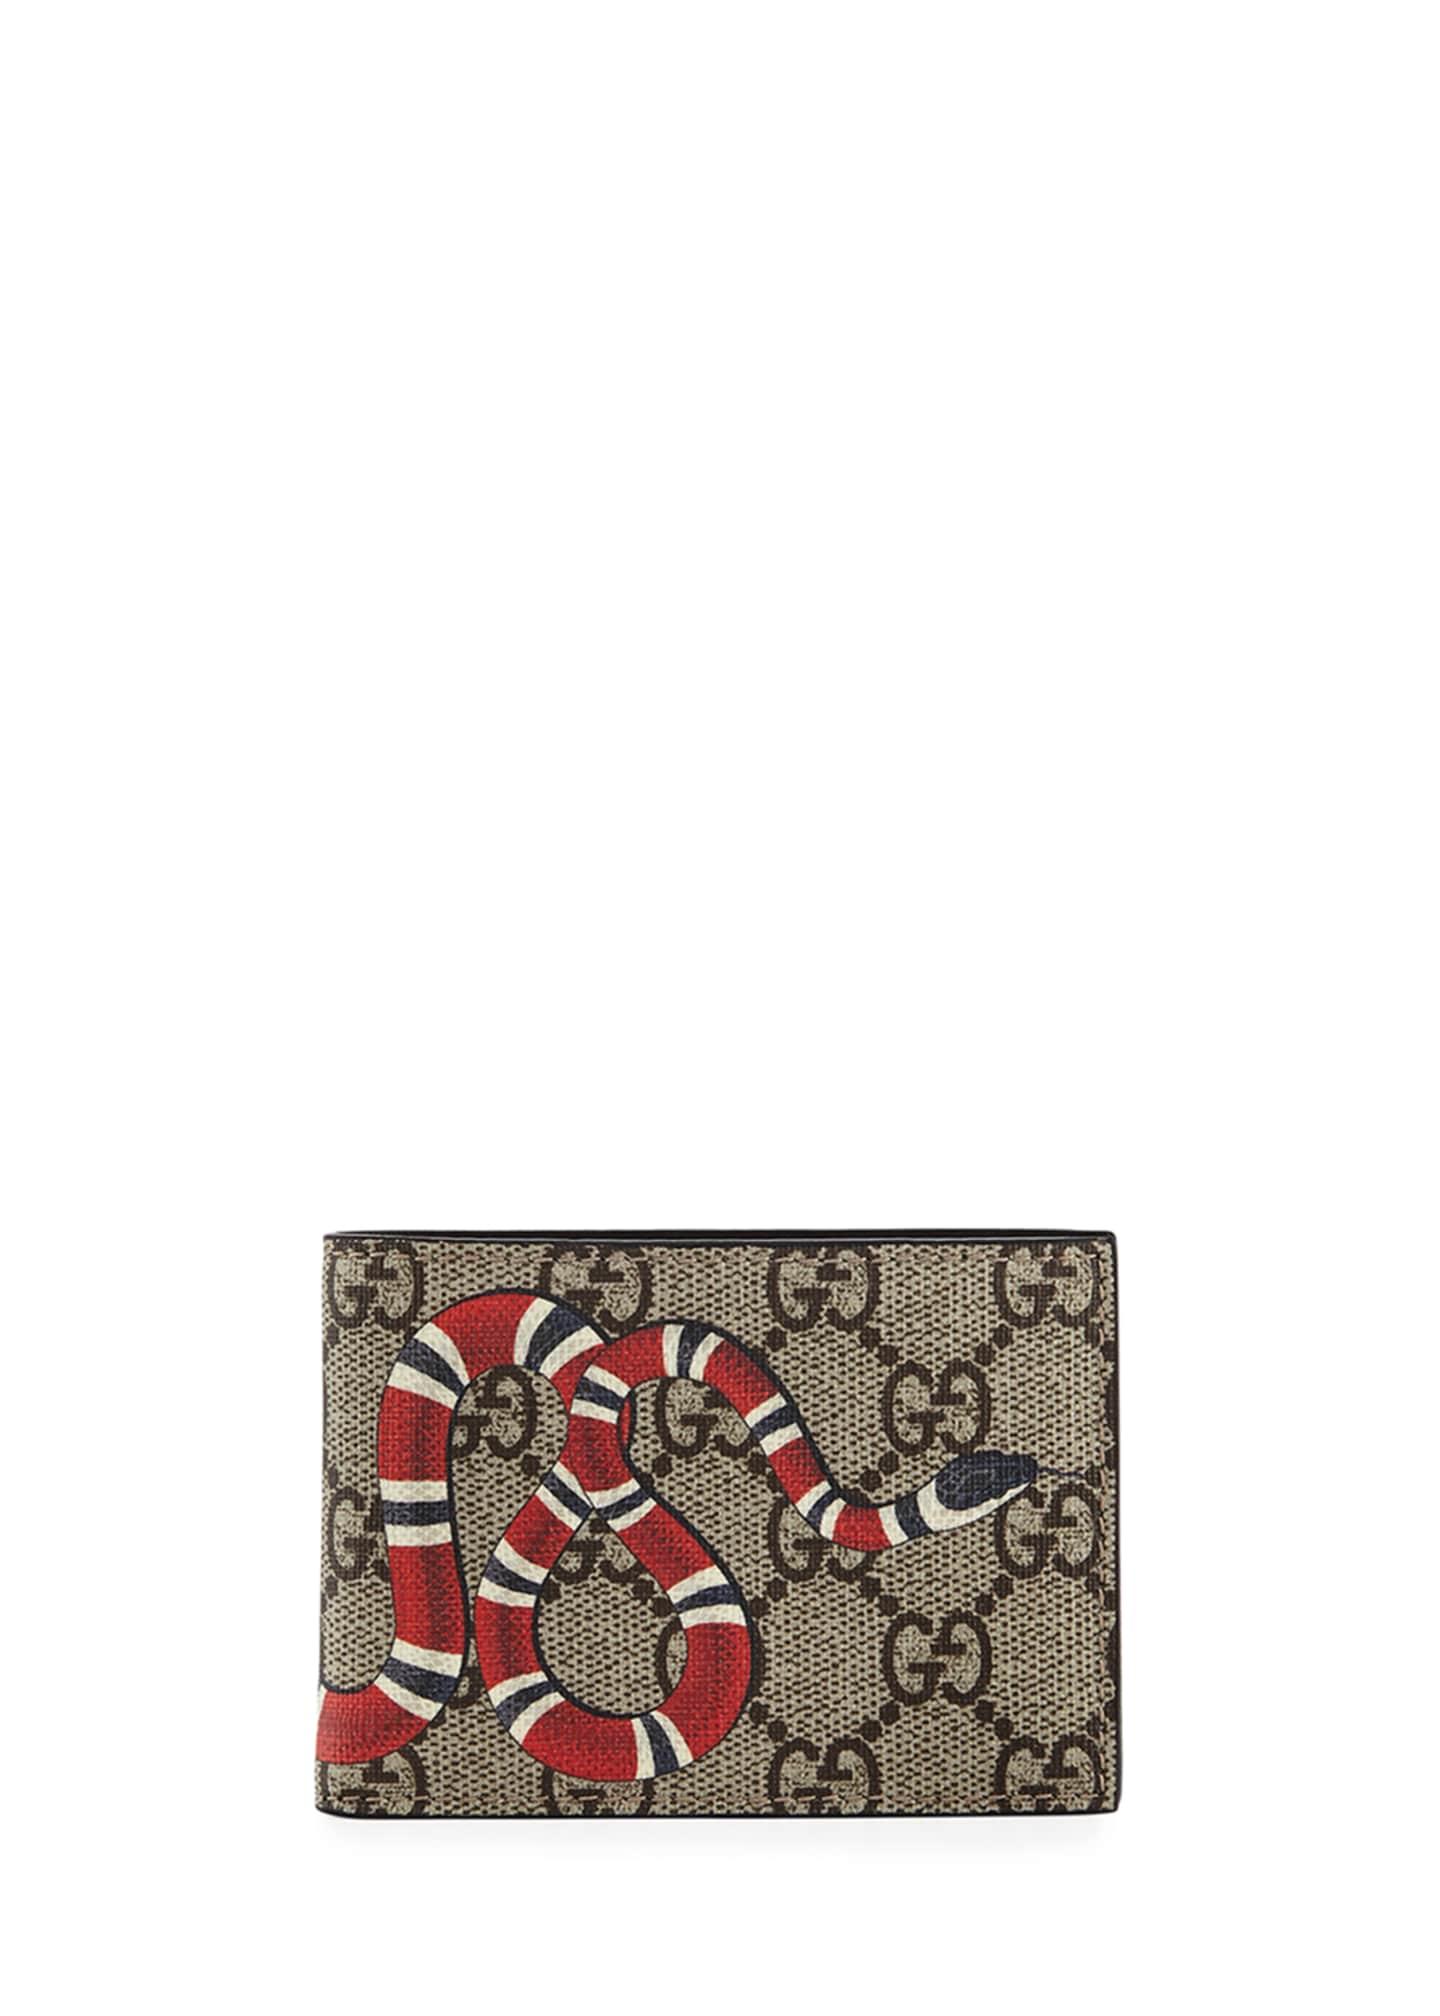 Gucci Bestiary Snake-Print GG Supreme Wallet